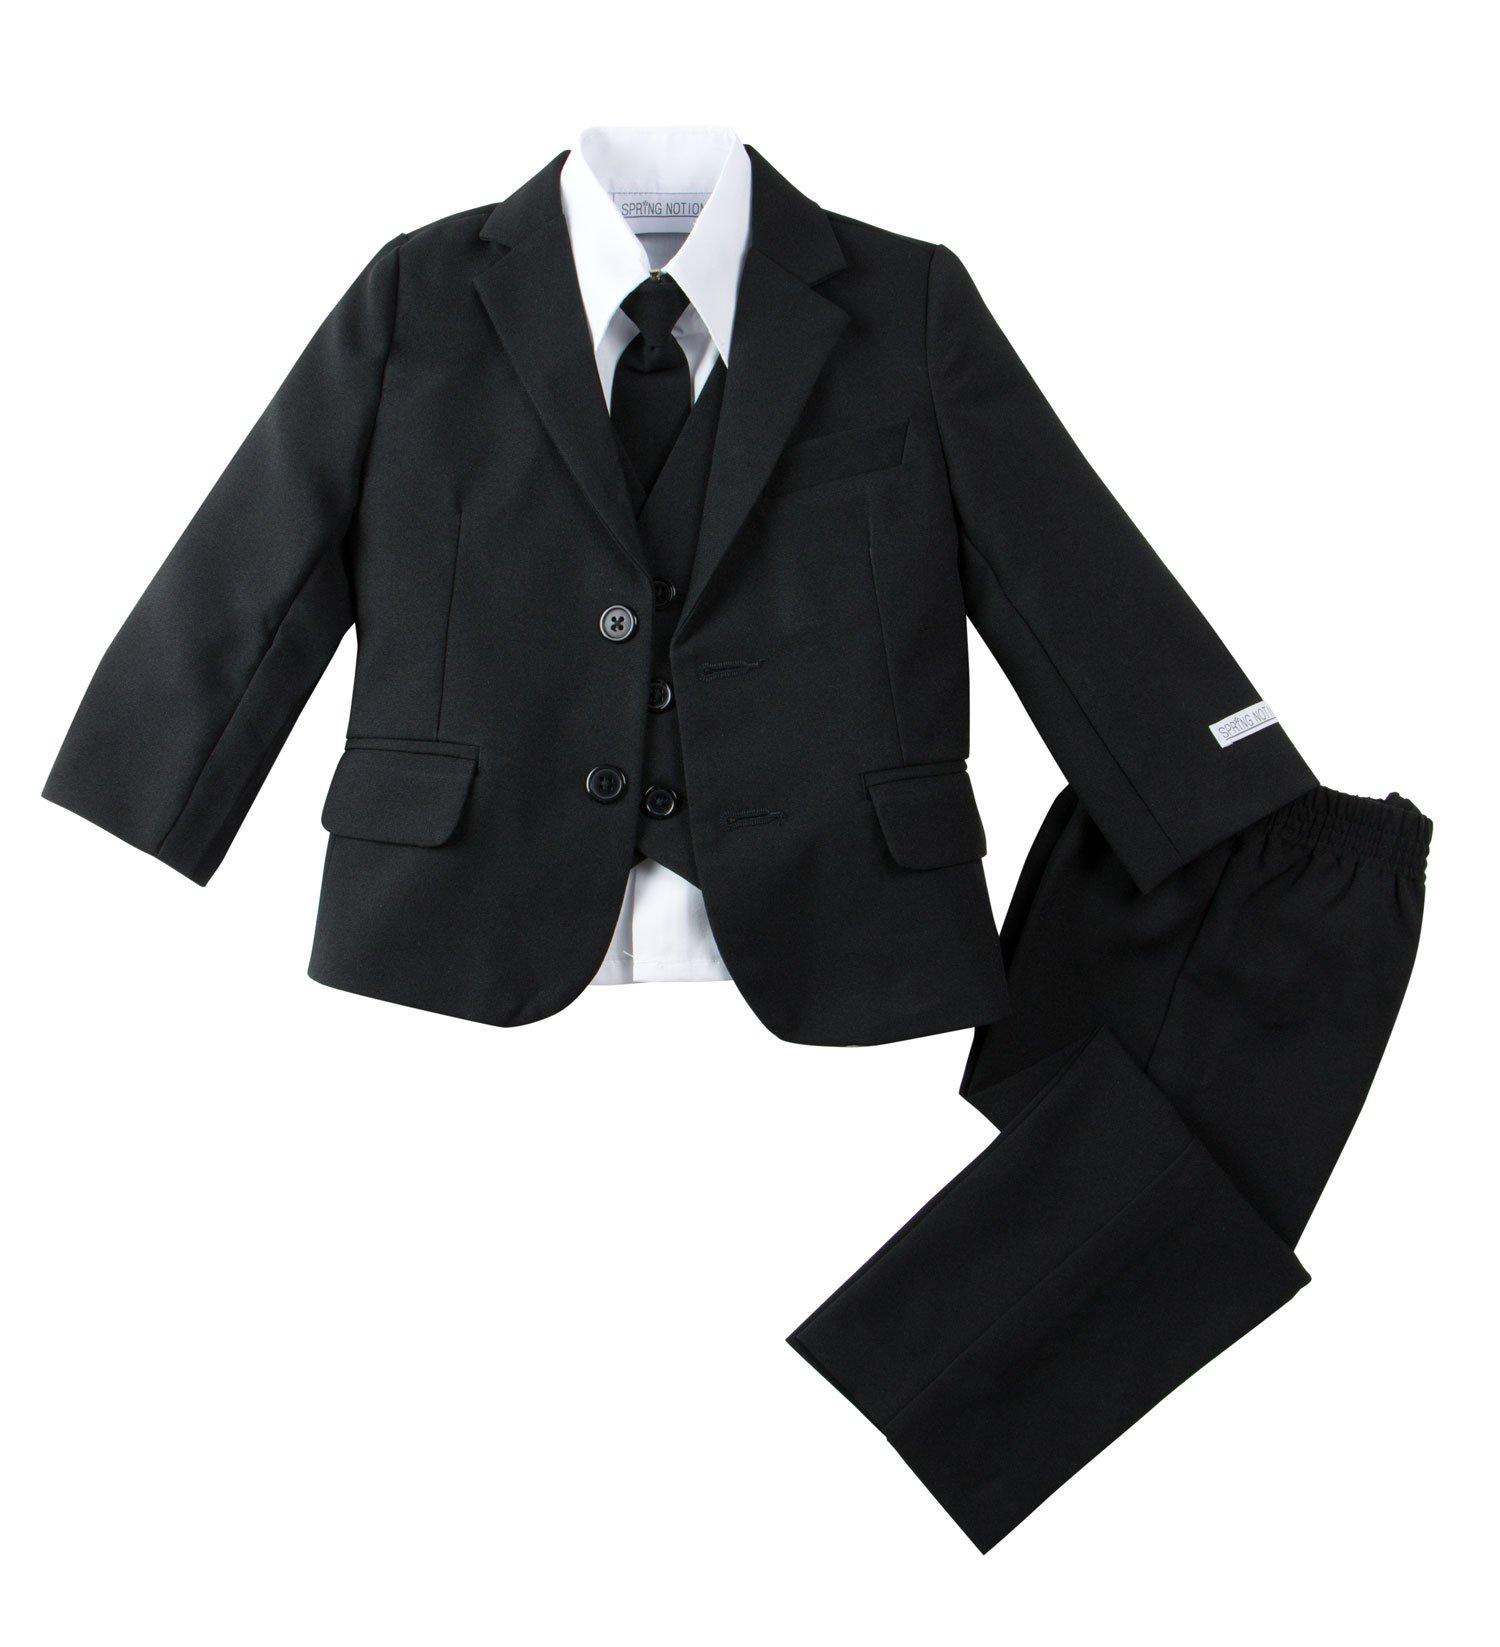 Spring Notion Baby Boys' Modern Fit Dress Suit Set Medium/6-12M Black by Spring Notion